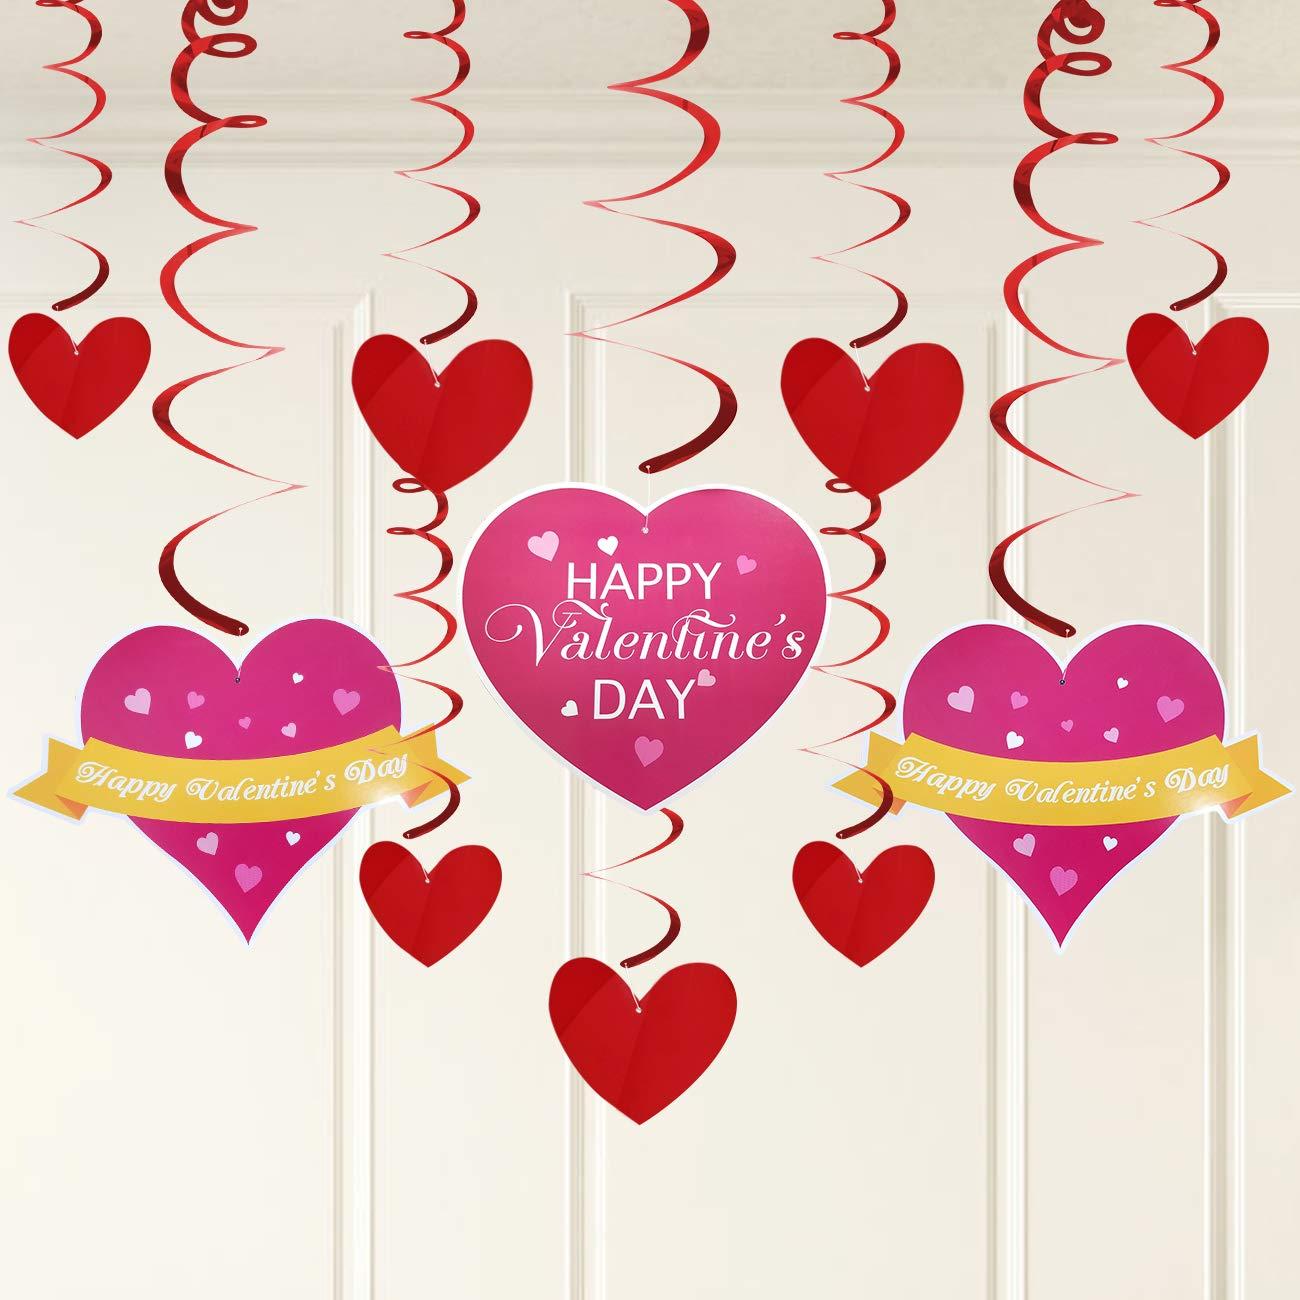 e26c9c0e7cb Amazon.com  Valentines Day Decorations - 30 Pieces Valentine Hanging Swirl  Decoration Heart Hanging Swirl Ceiling Hanging Swirl Accessories - Great  for ...